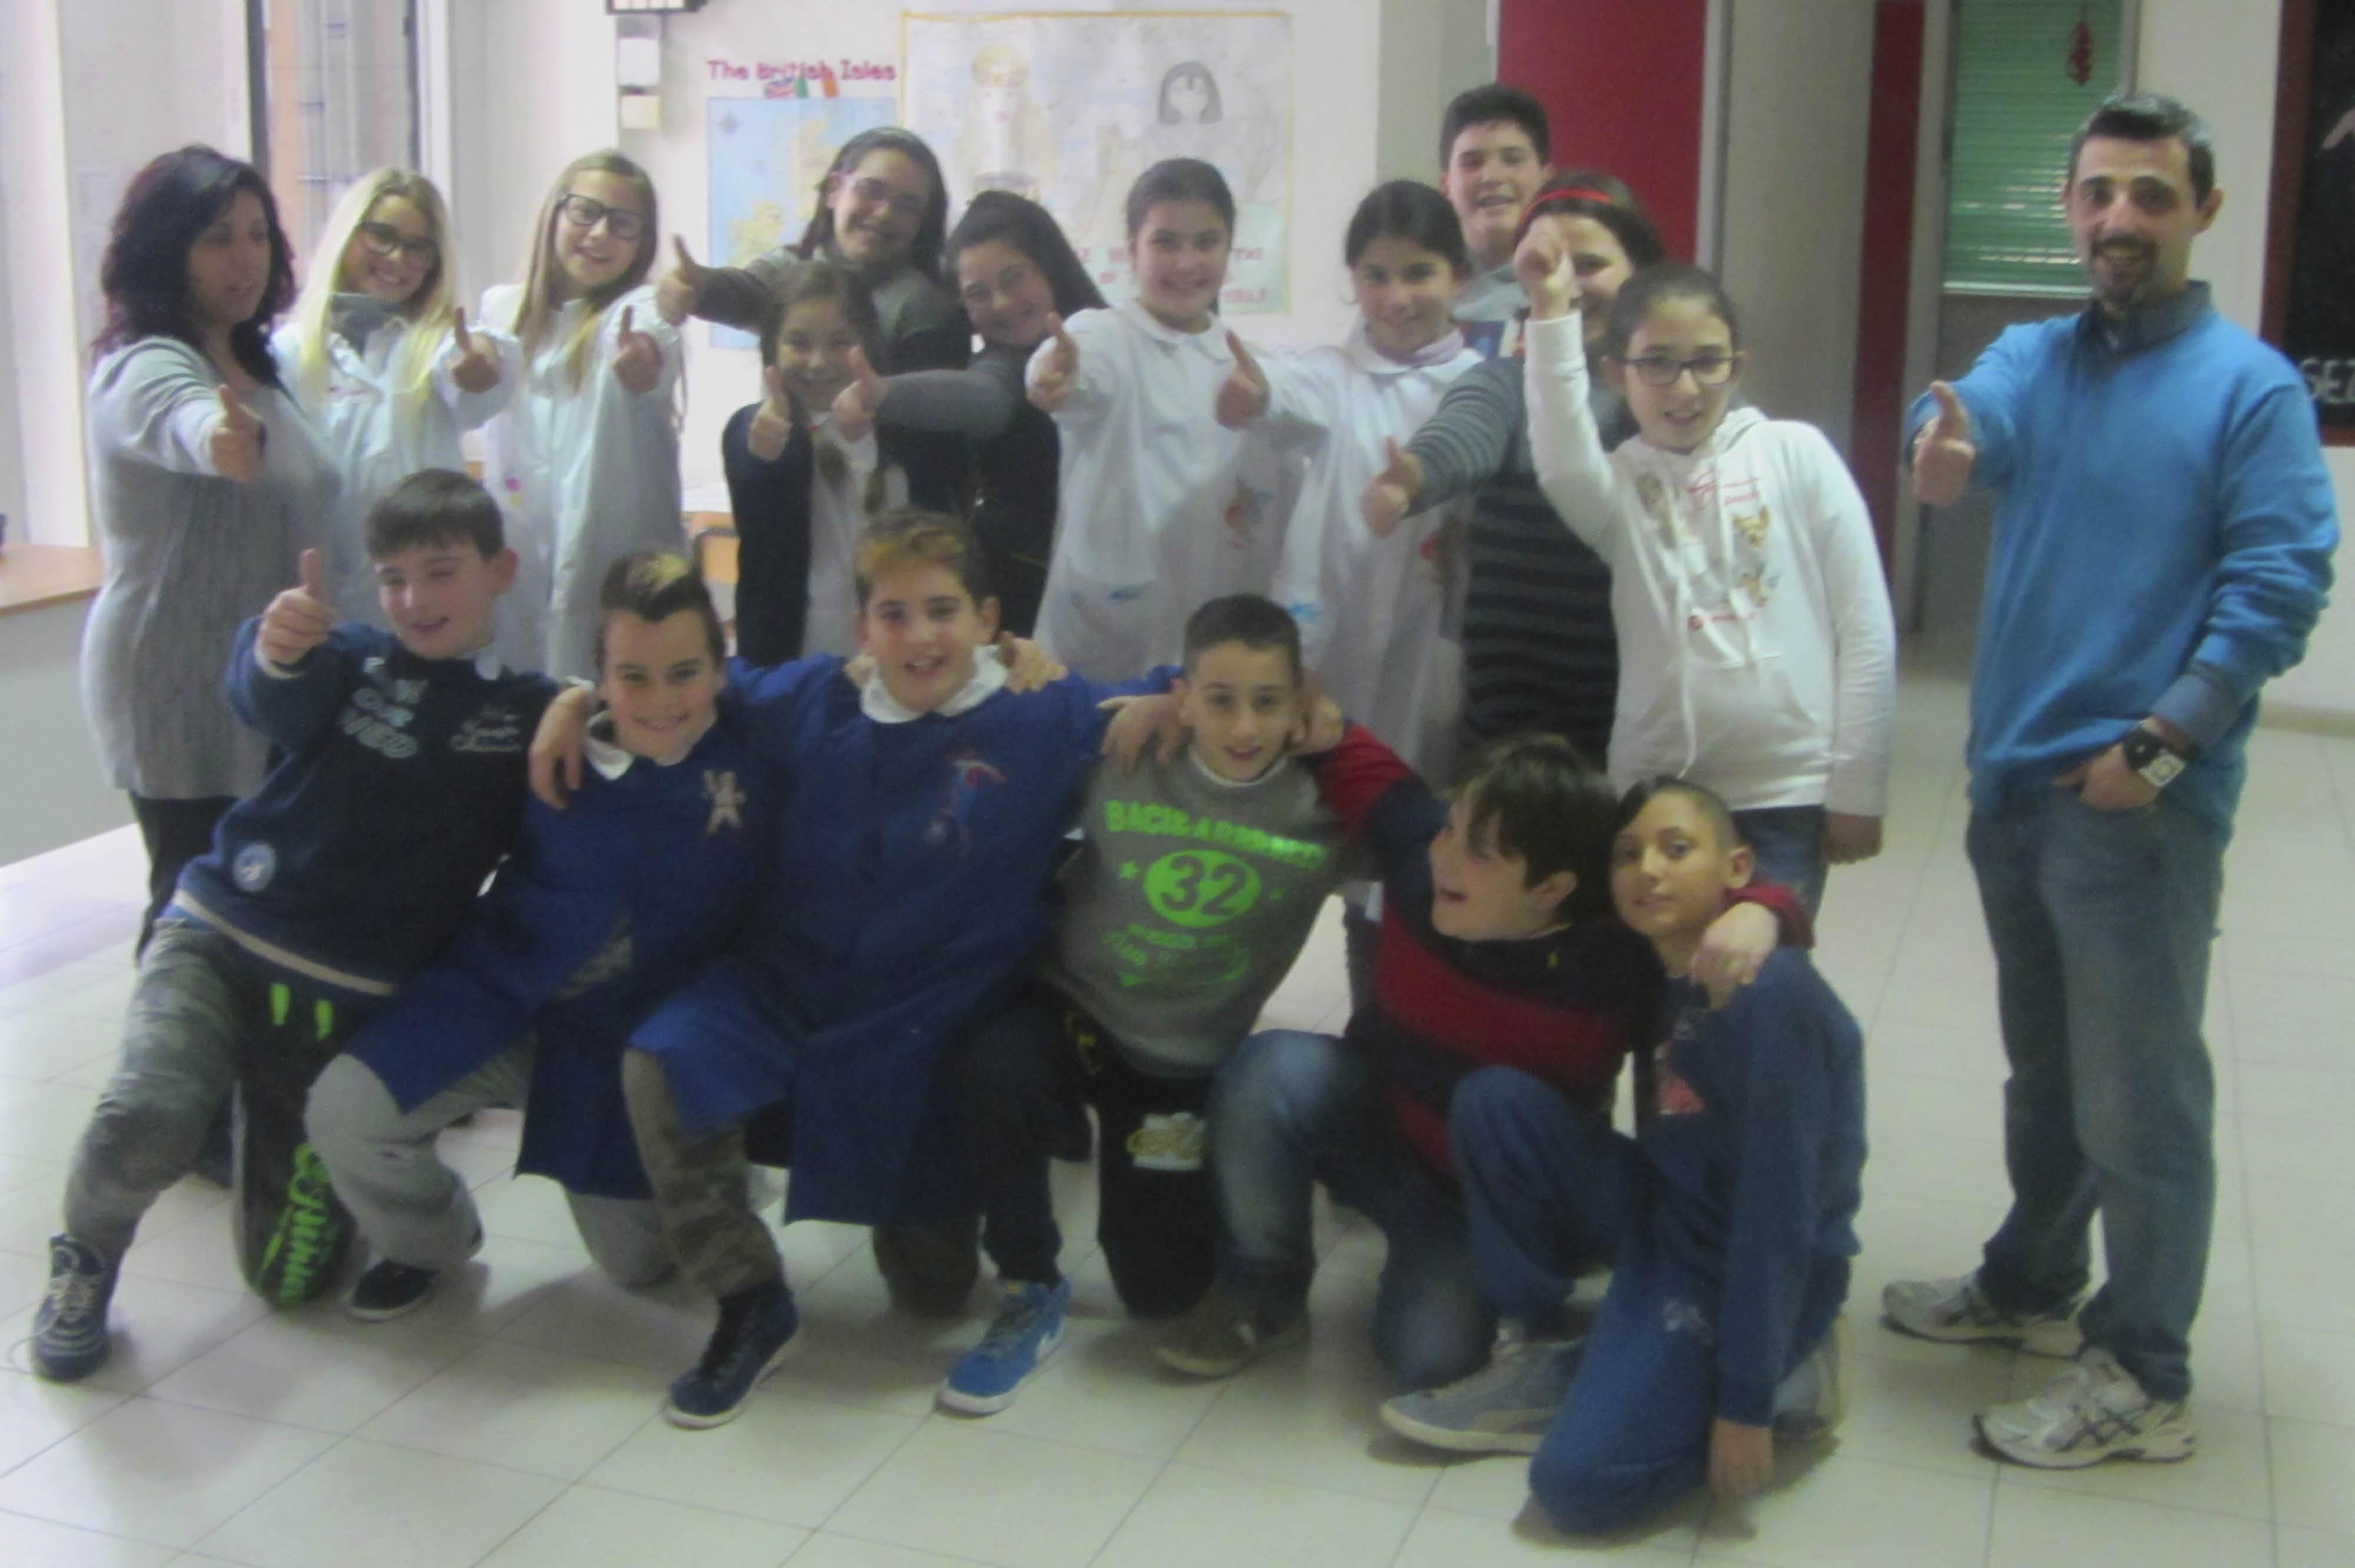 Benedict School Pomigliano d'Arco @ Somma13